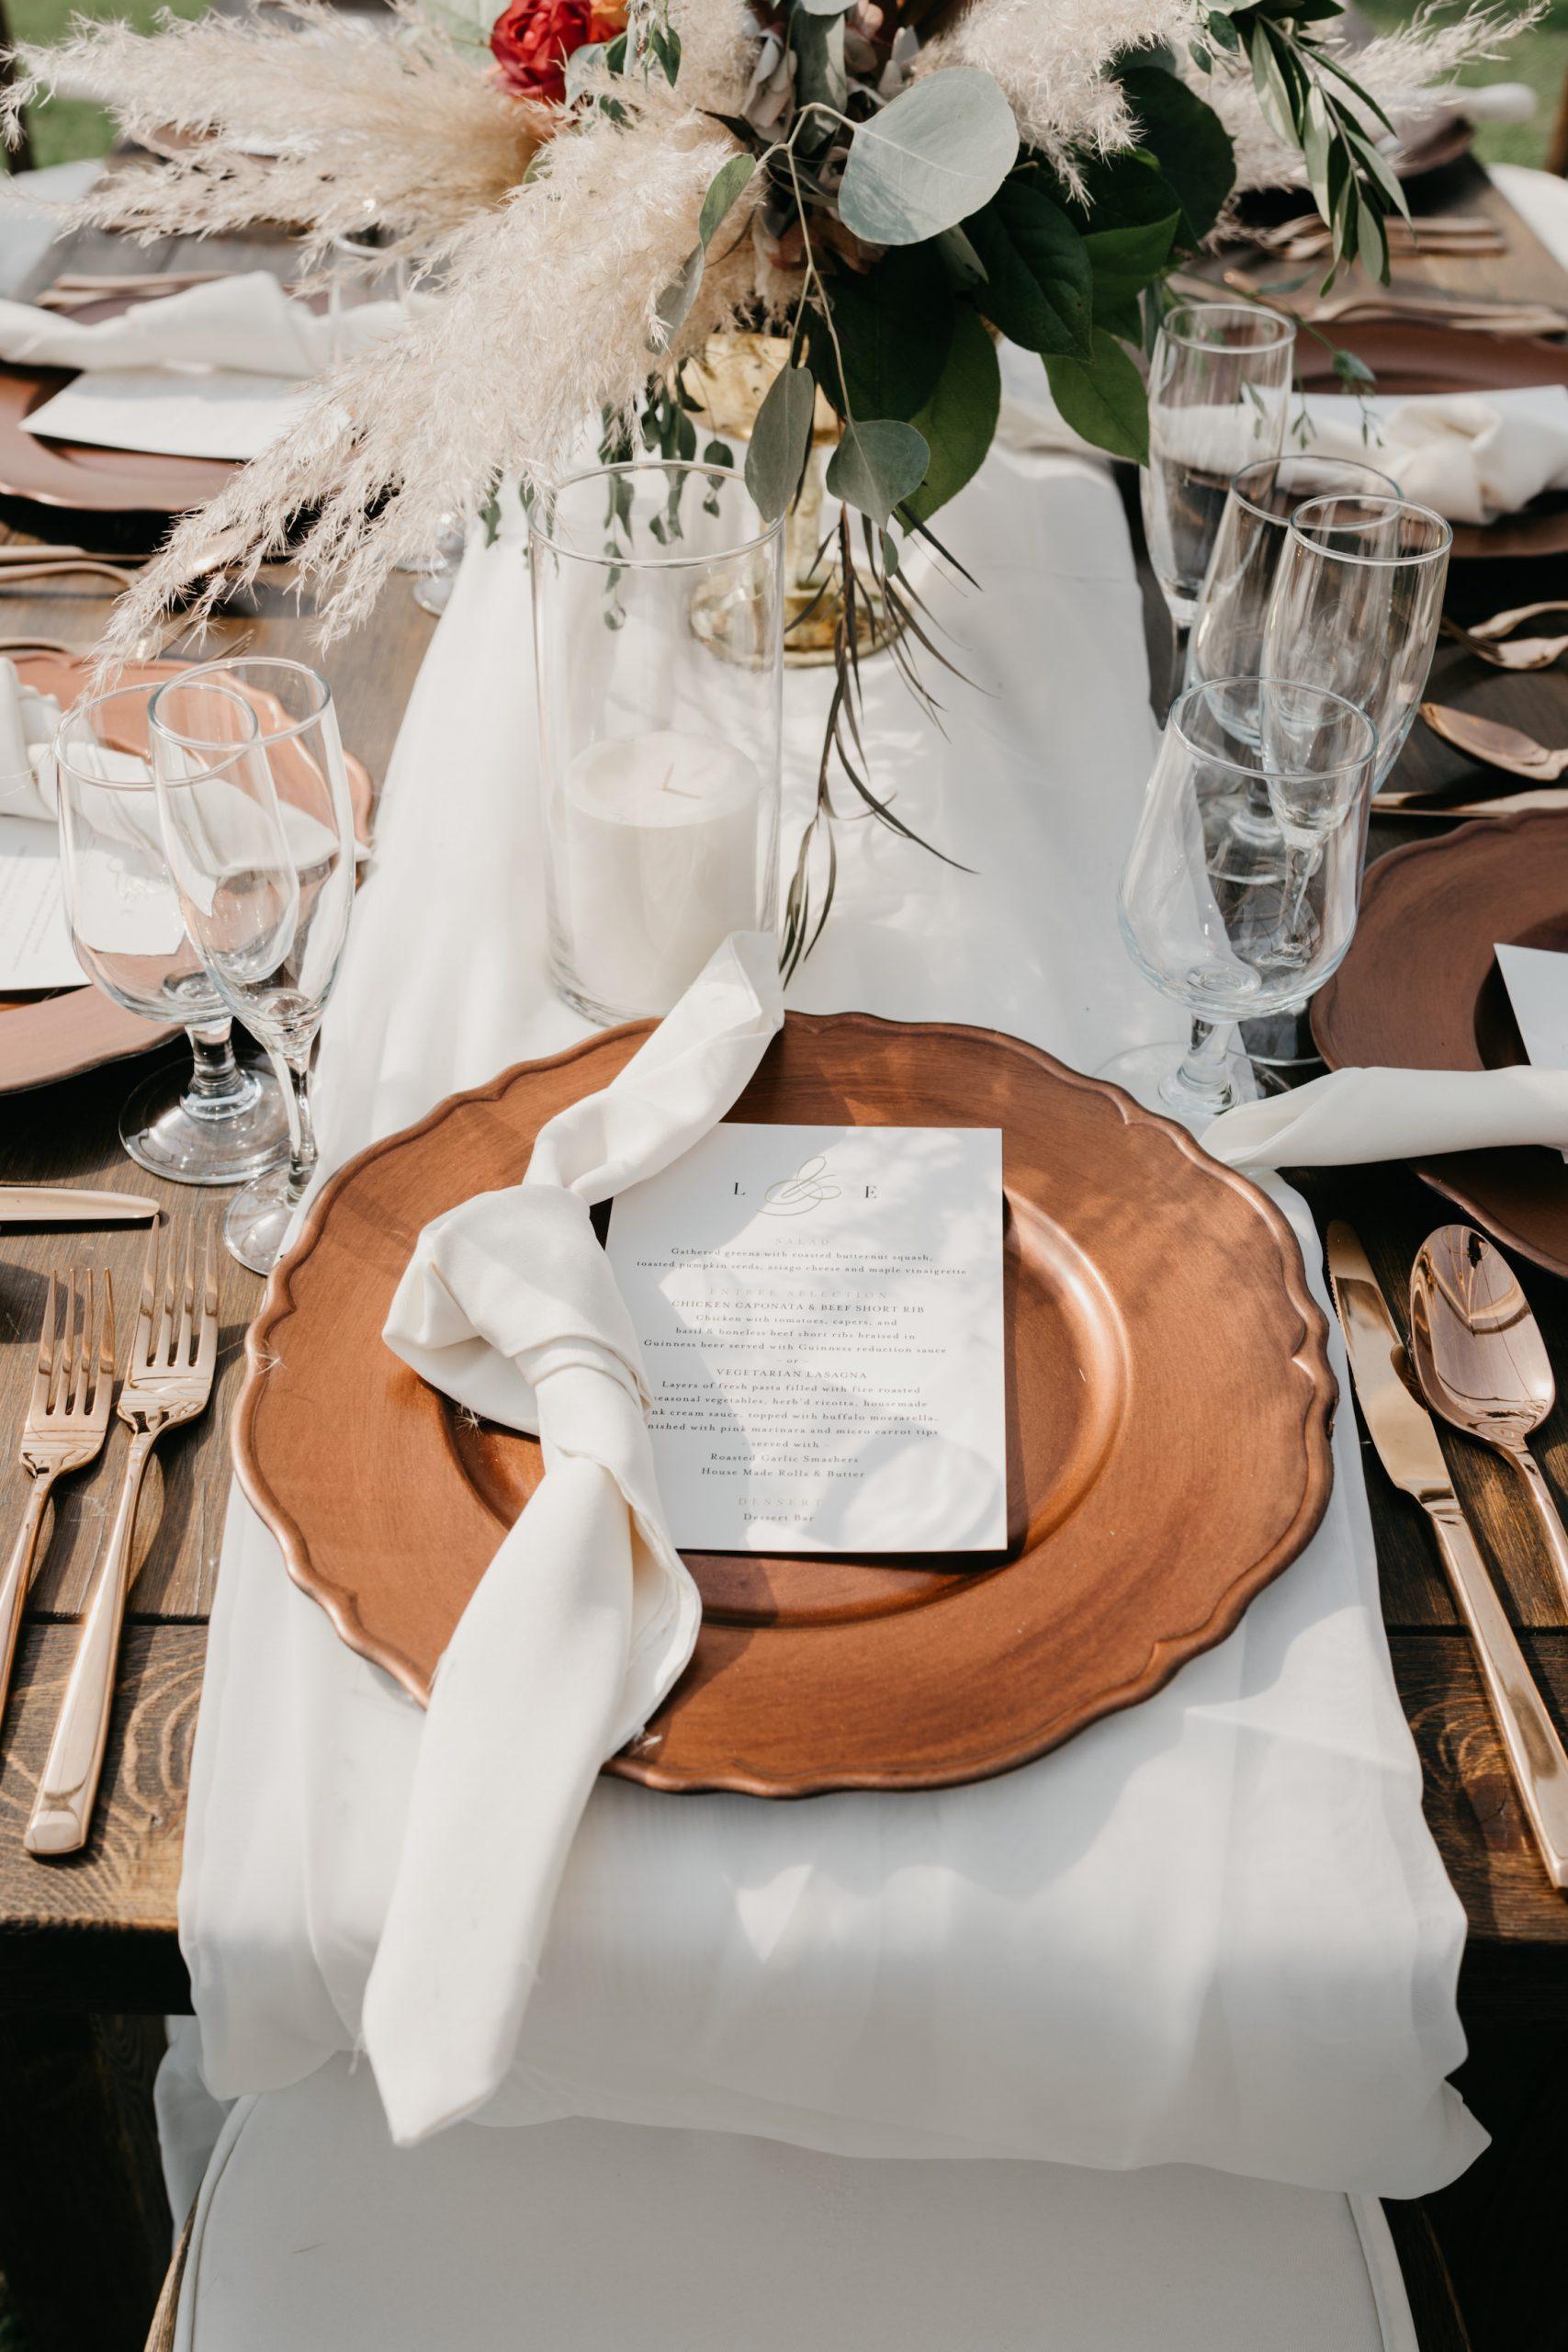 Evanelle Vineyards Wedding tablescape, image by Fatima Elreda Photo